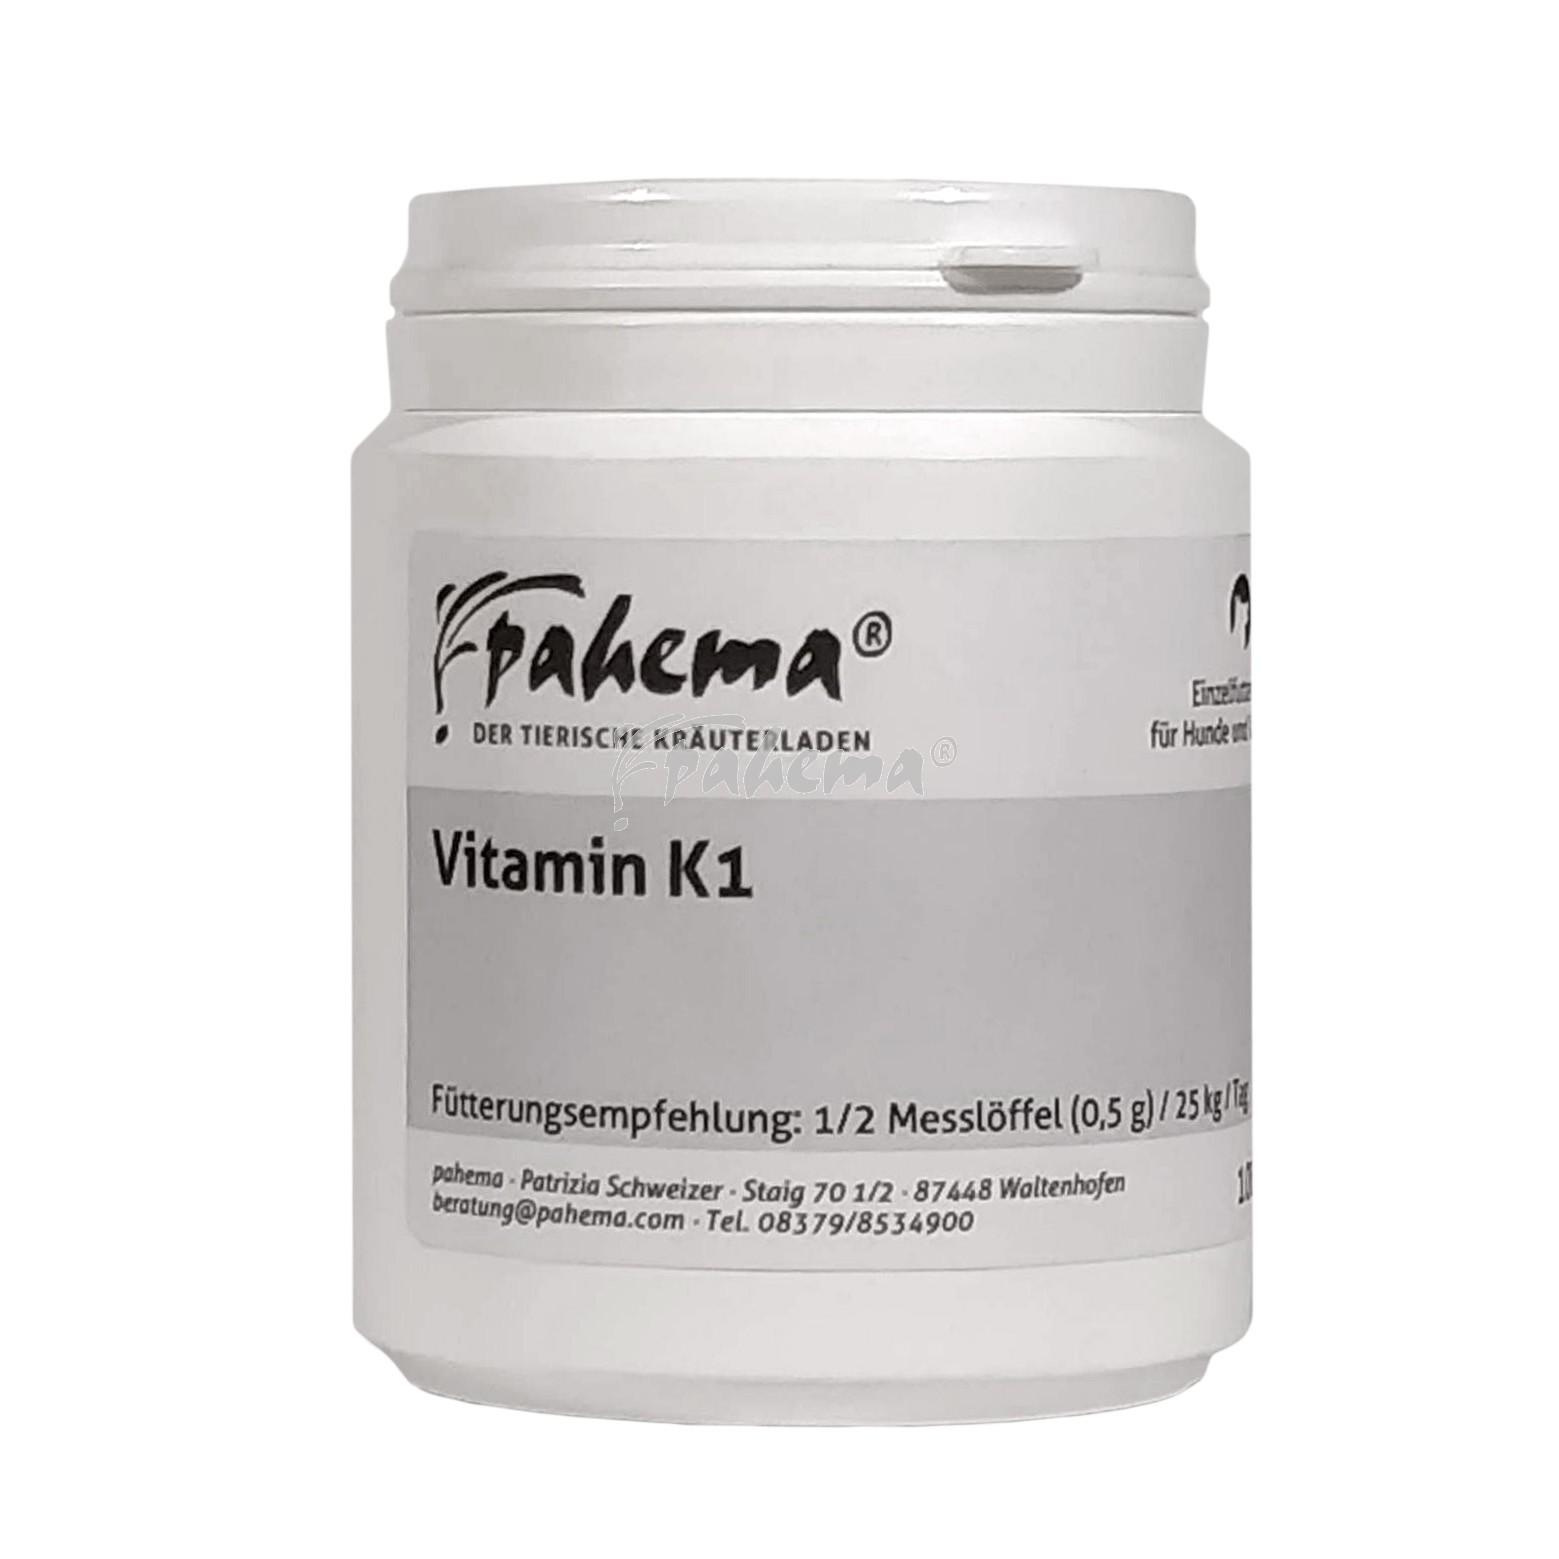 Produktbild: Vitamin K1